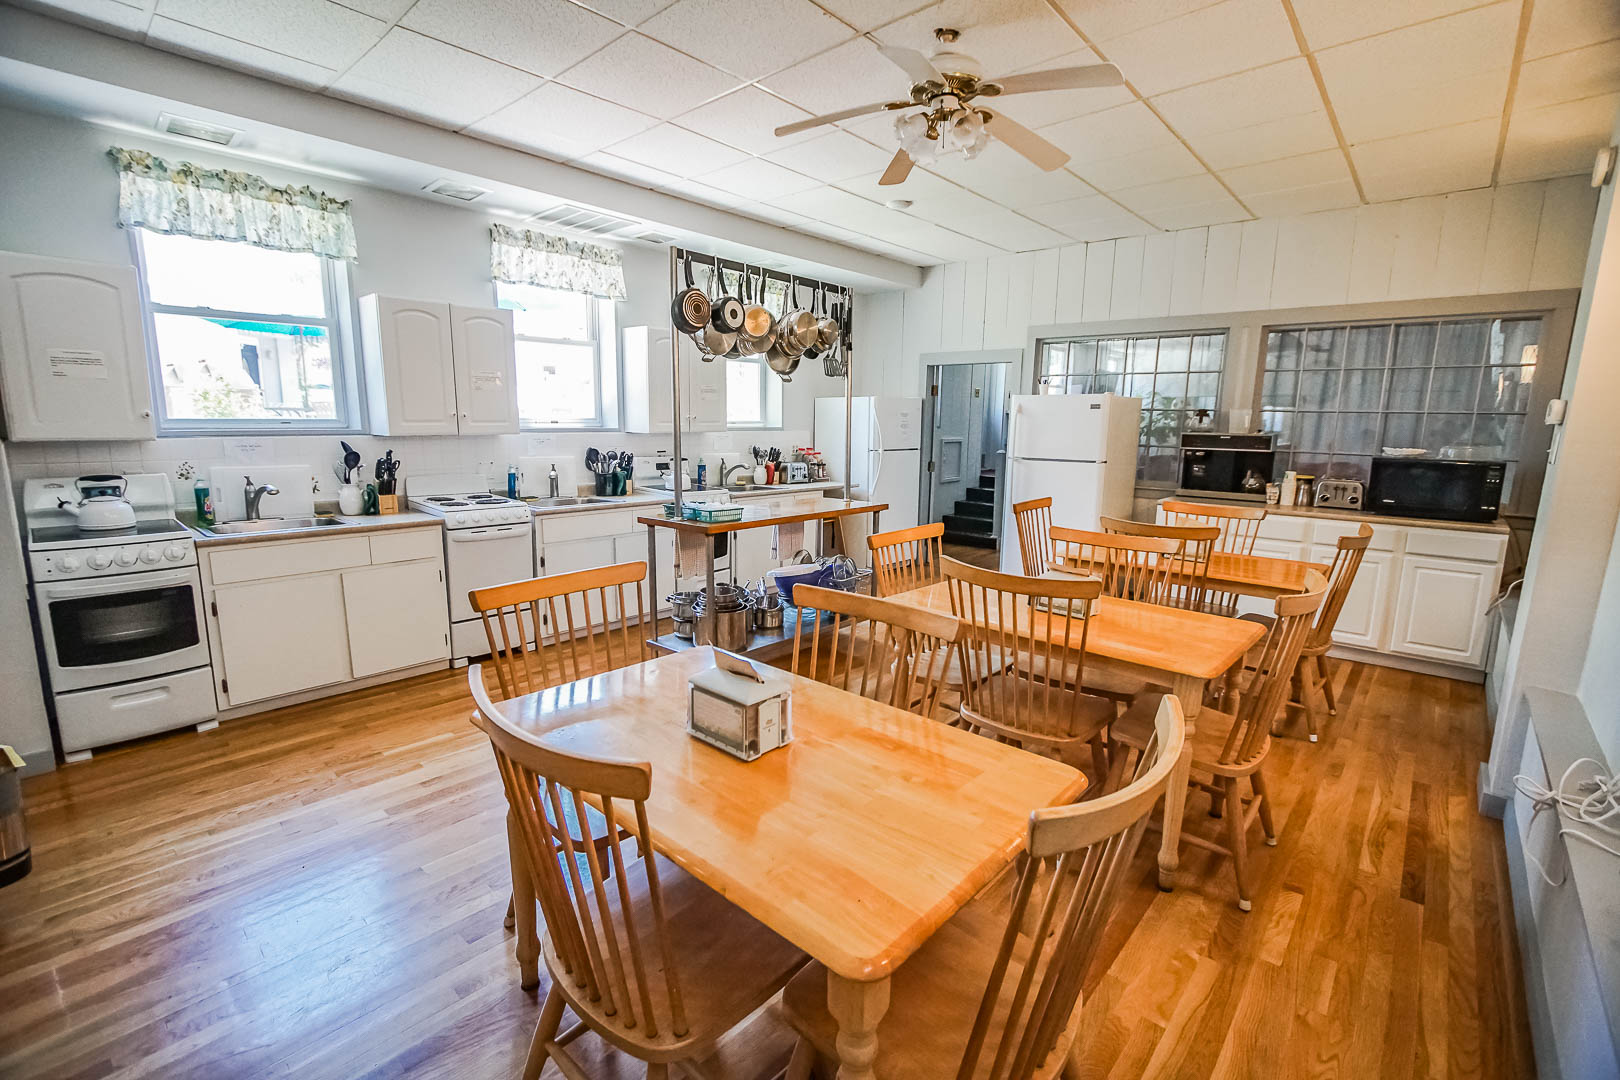 A welcoming communal kitchen at VRI's Harbor Landing Resort in Massachusetts.